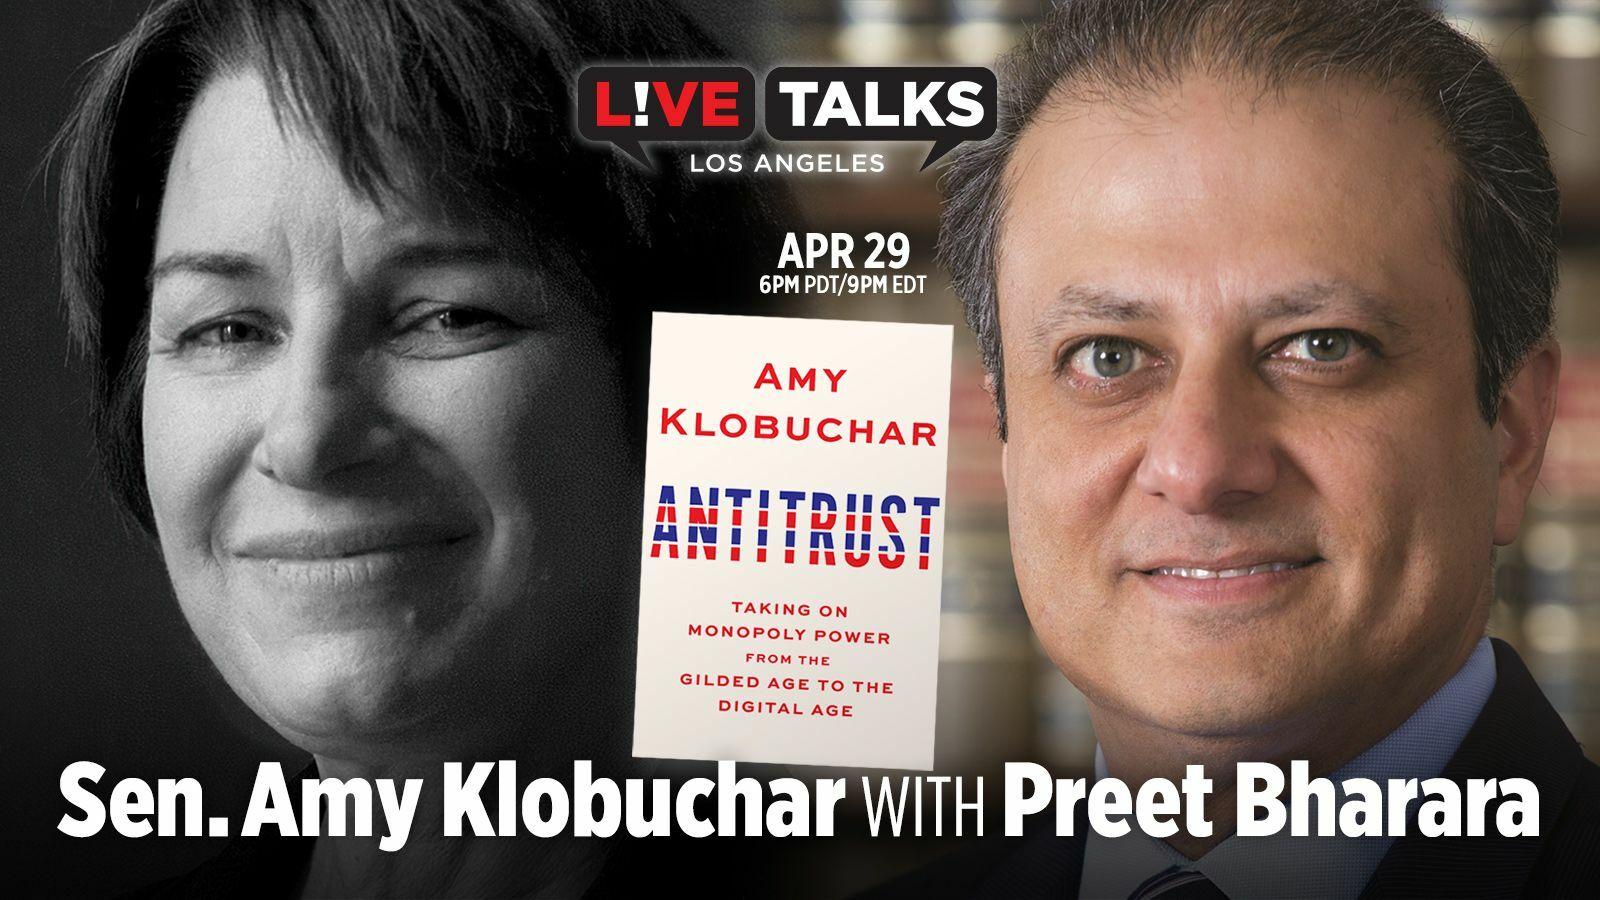 Senator Amy Klobuchar with Preet Bharara - Online